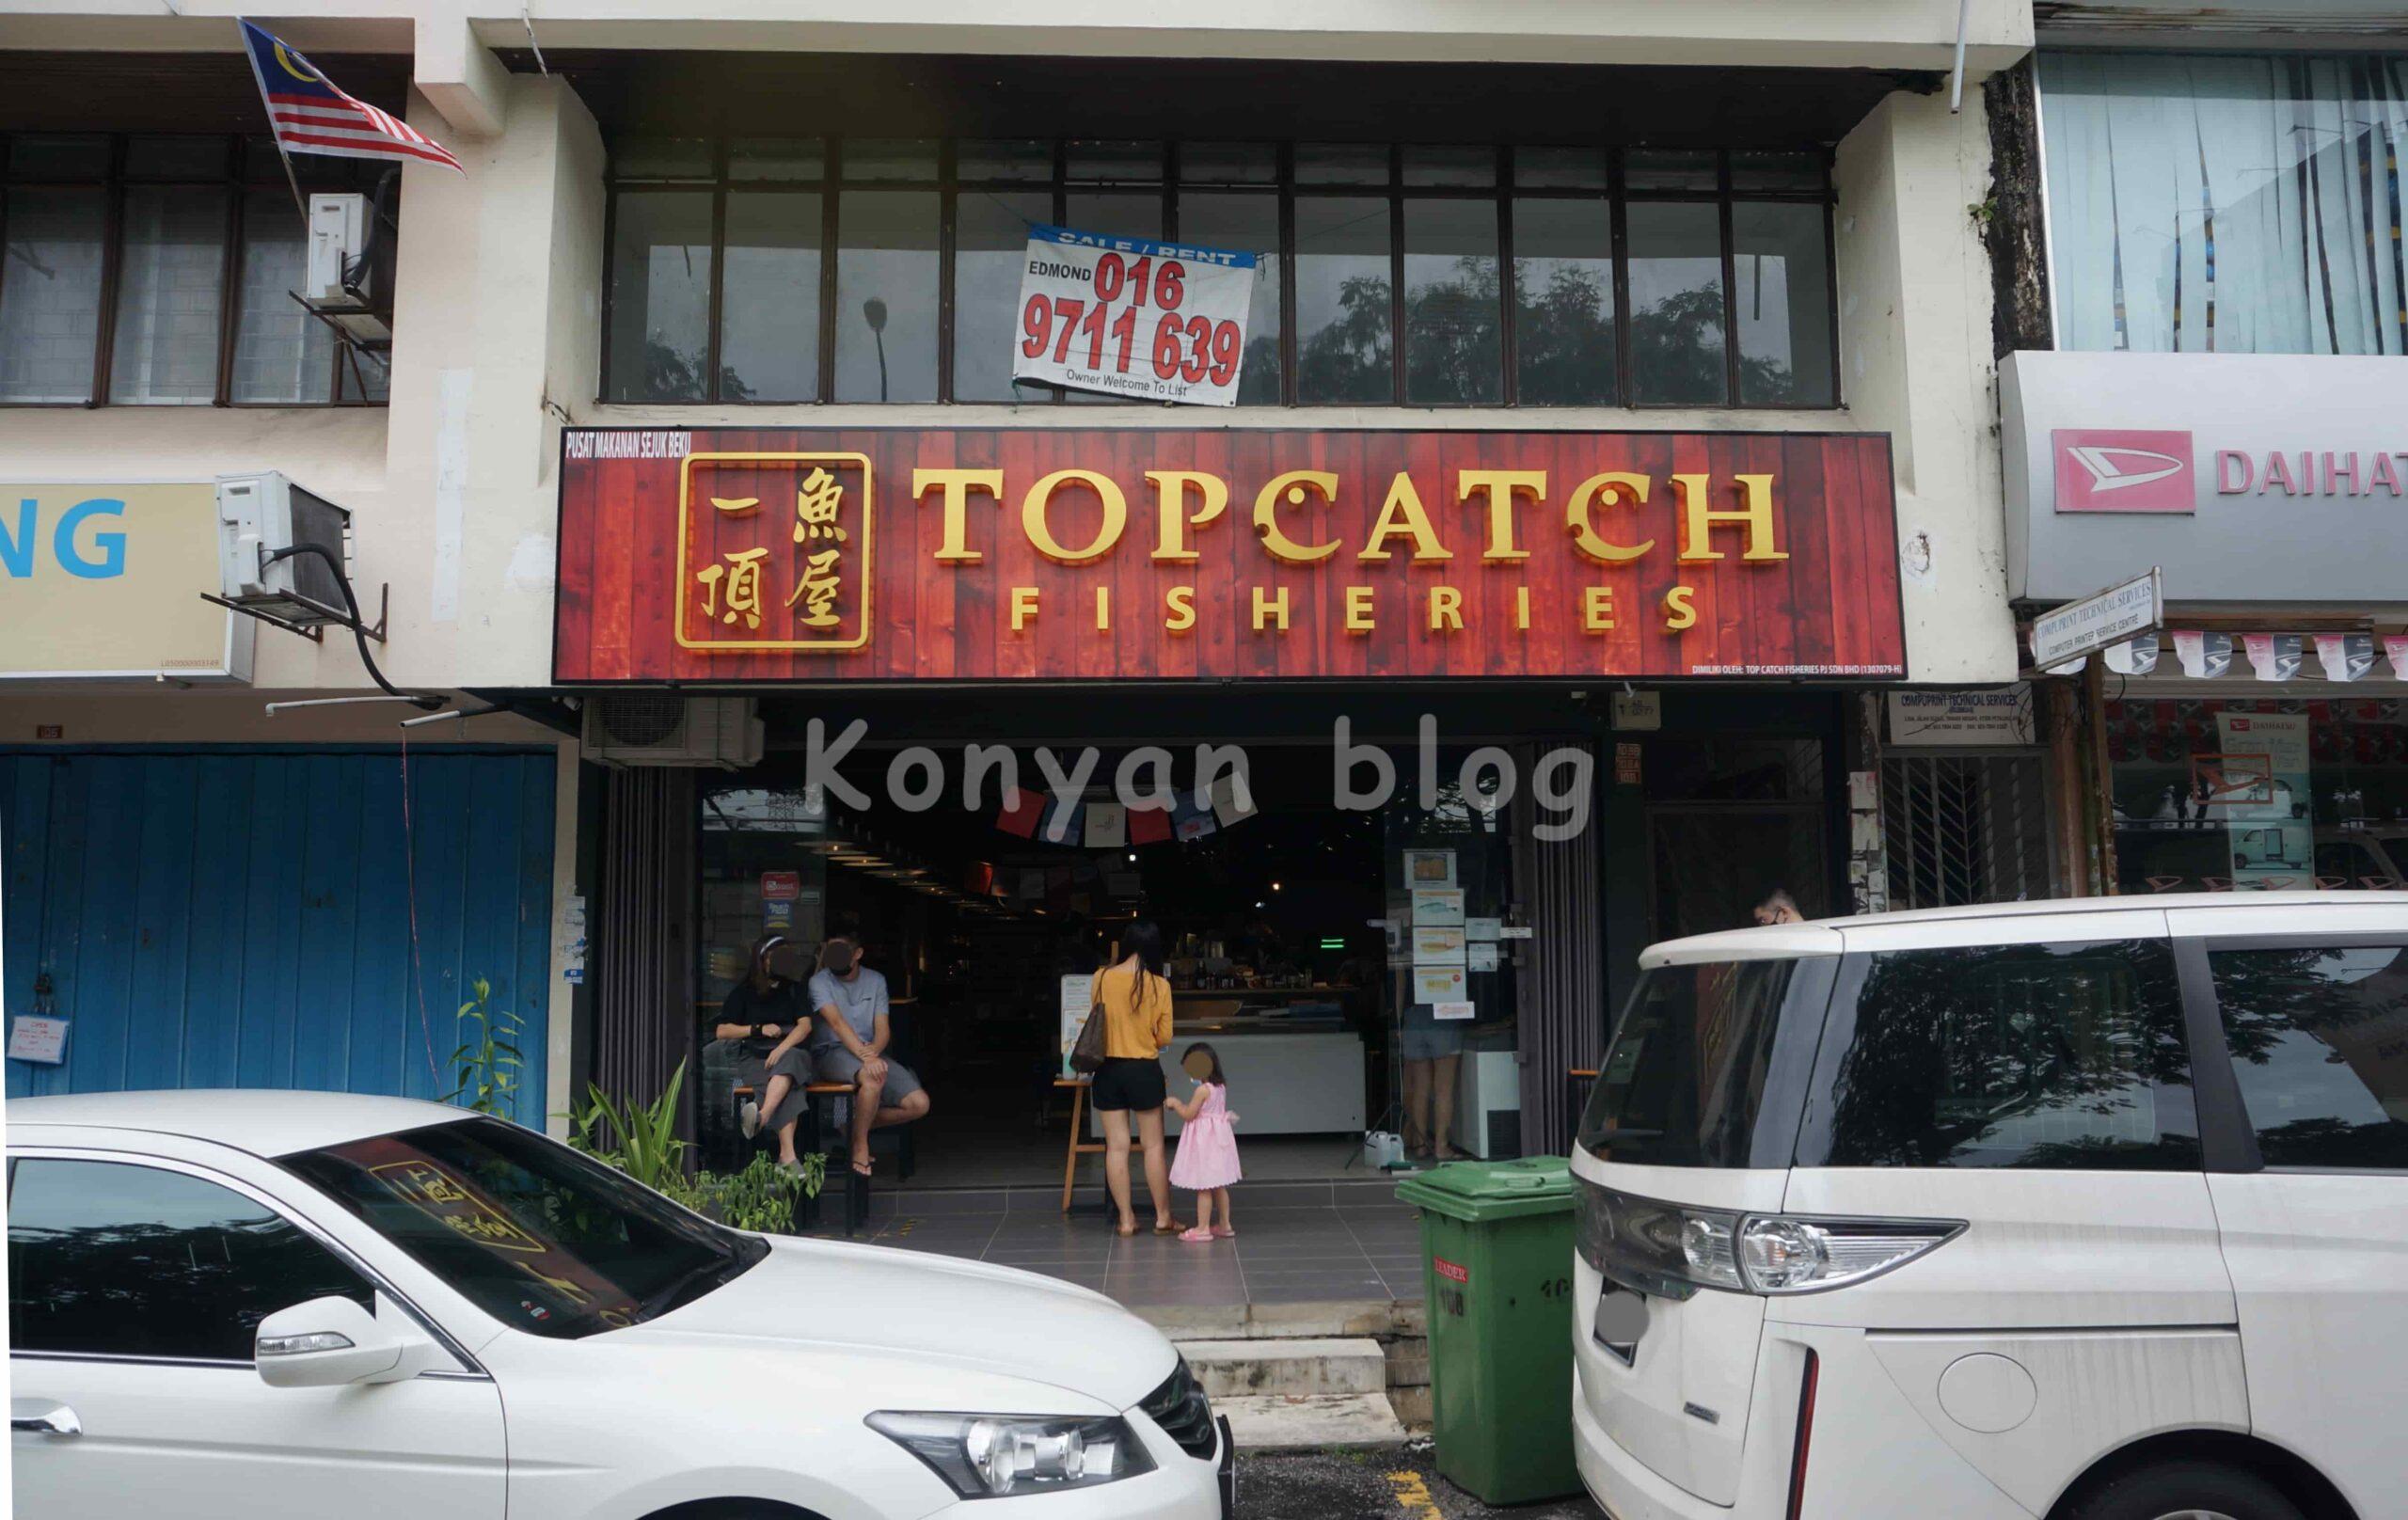 Top Catch Fisheries 一頂魚屋 刺身